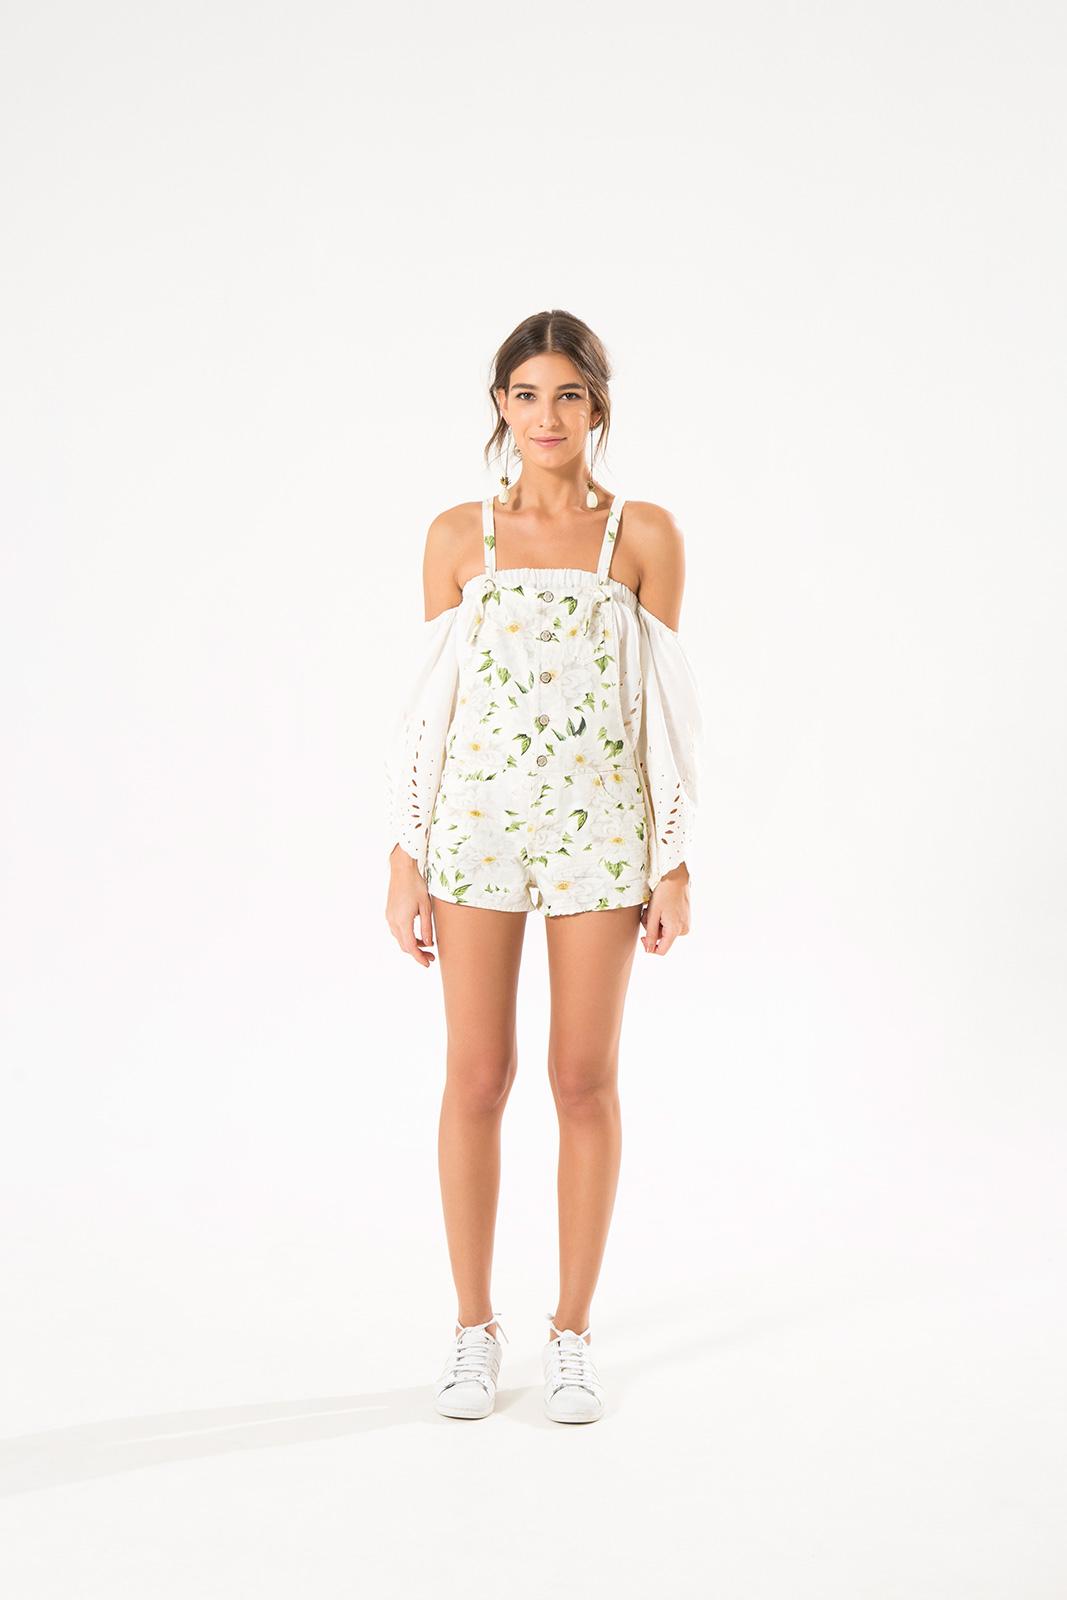 romper, ashanti brazil, fashion, floral, summer dress